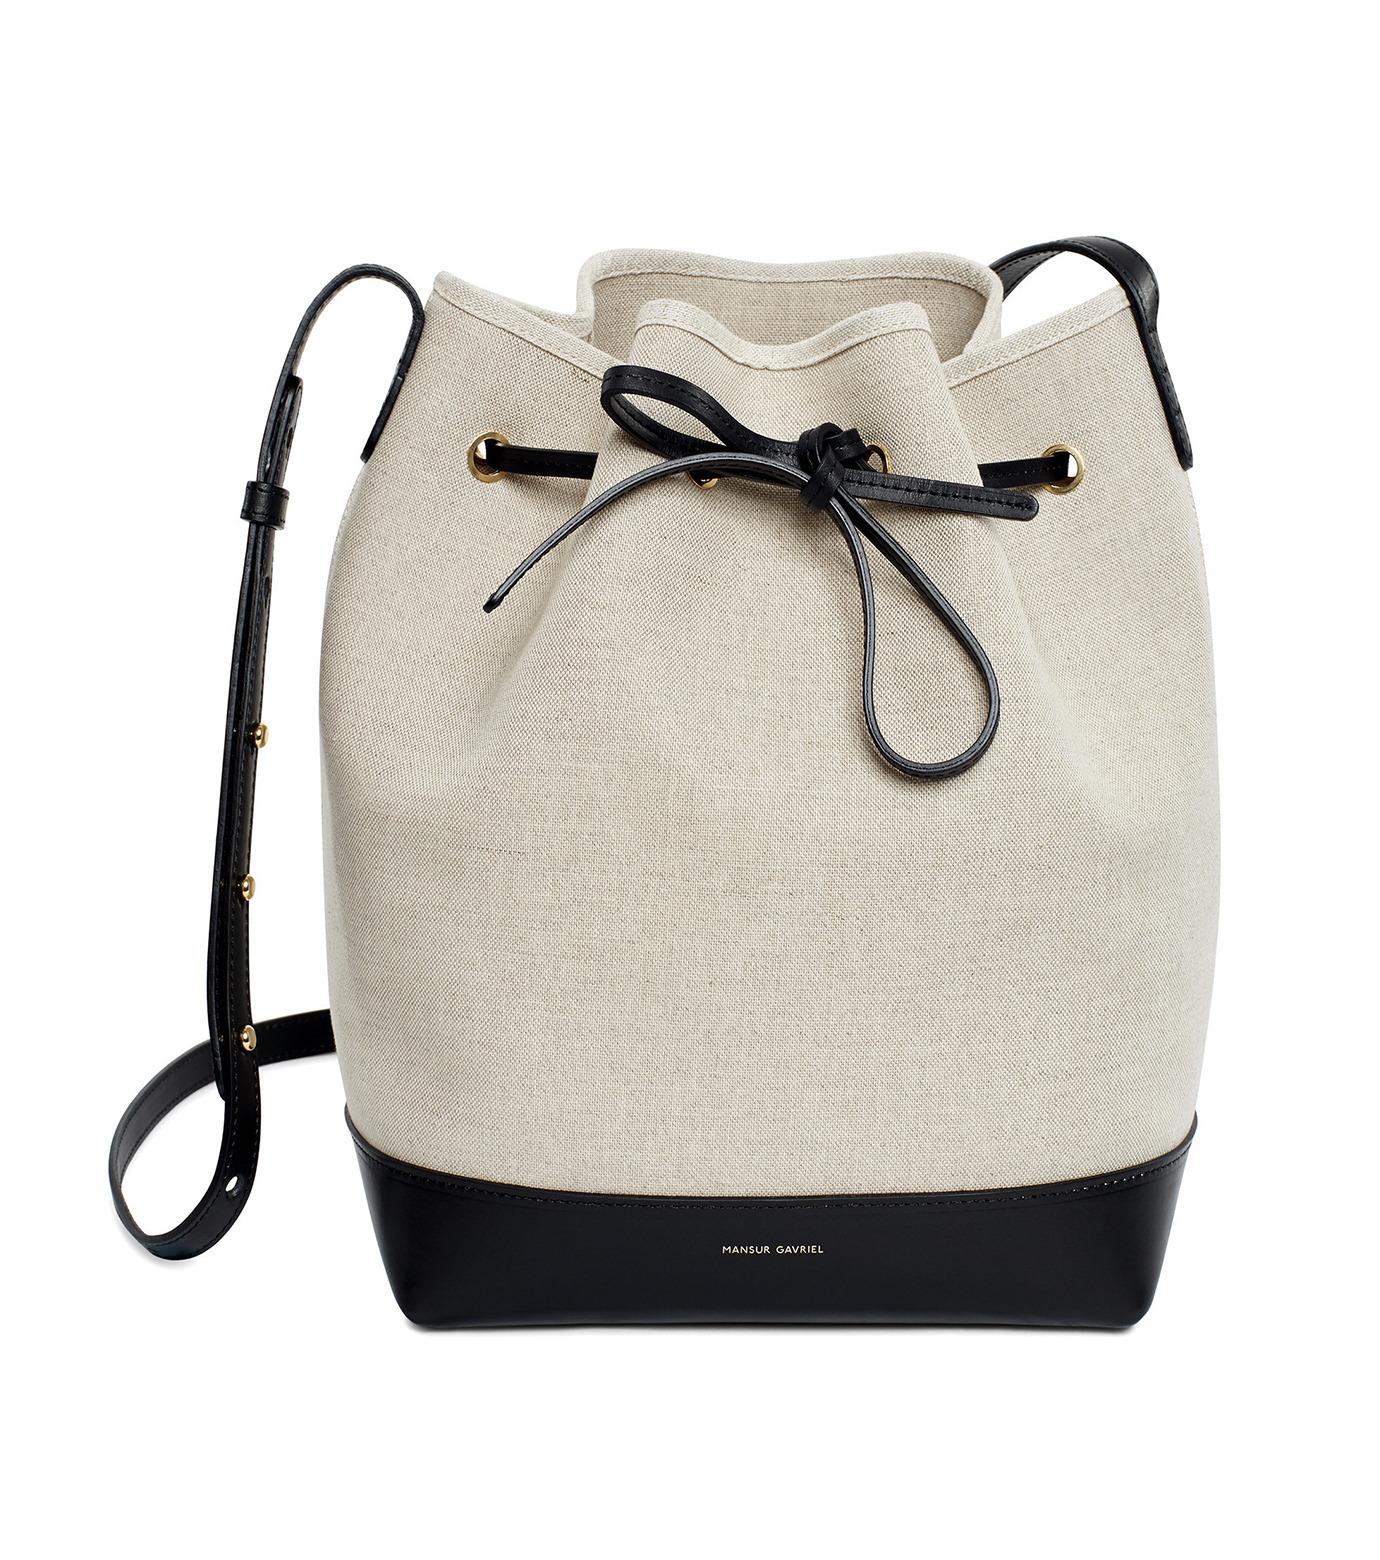 Mansur Gavriel(マンサーガブリエル)のCanvas Bucket Bag-WHITE(バッグ/bag)-HBB003CN-5 拡大詳細画像1